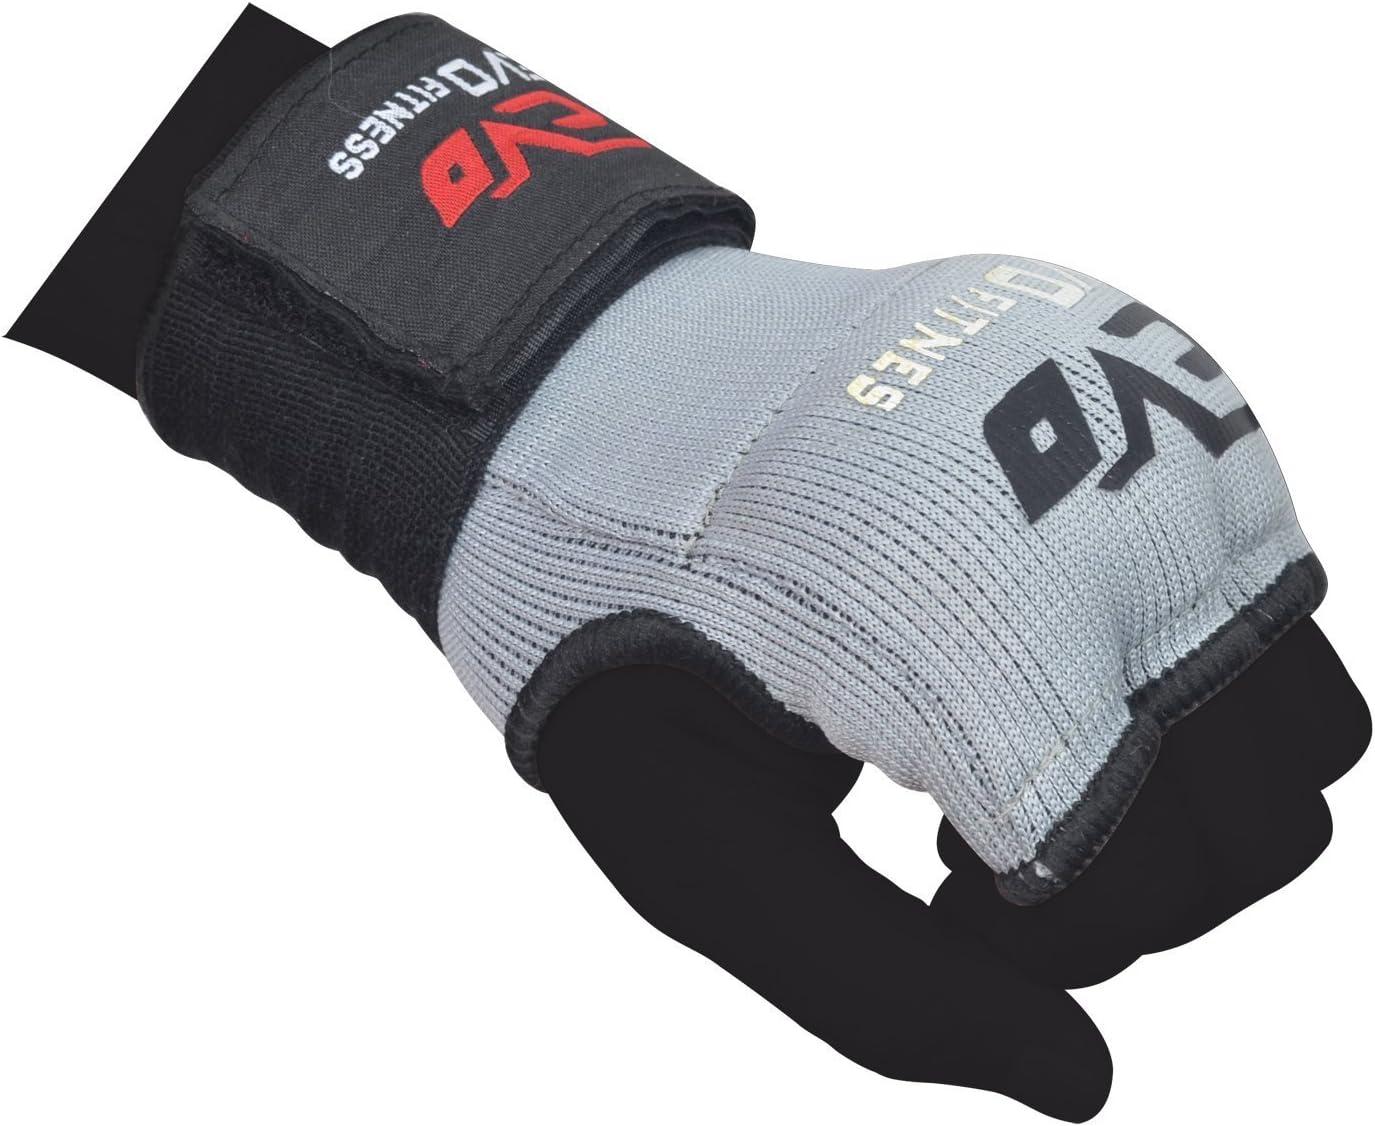 EVO Fitness Elasticated GEL Inner Gloves Boxing Bag Hand Wraps MMA Grappling UFC